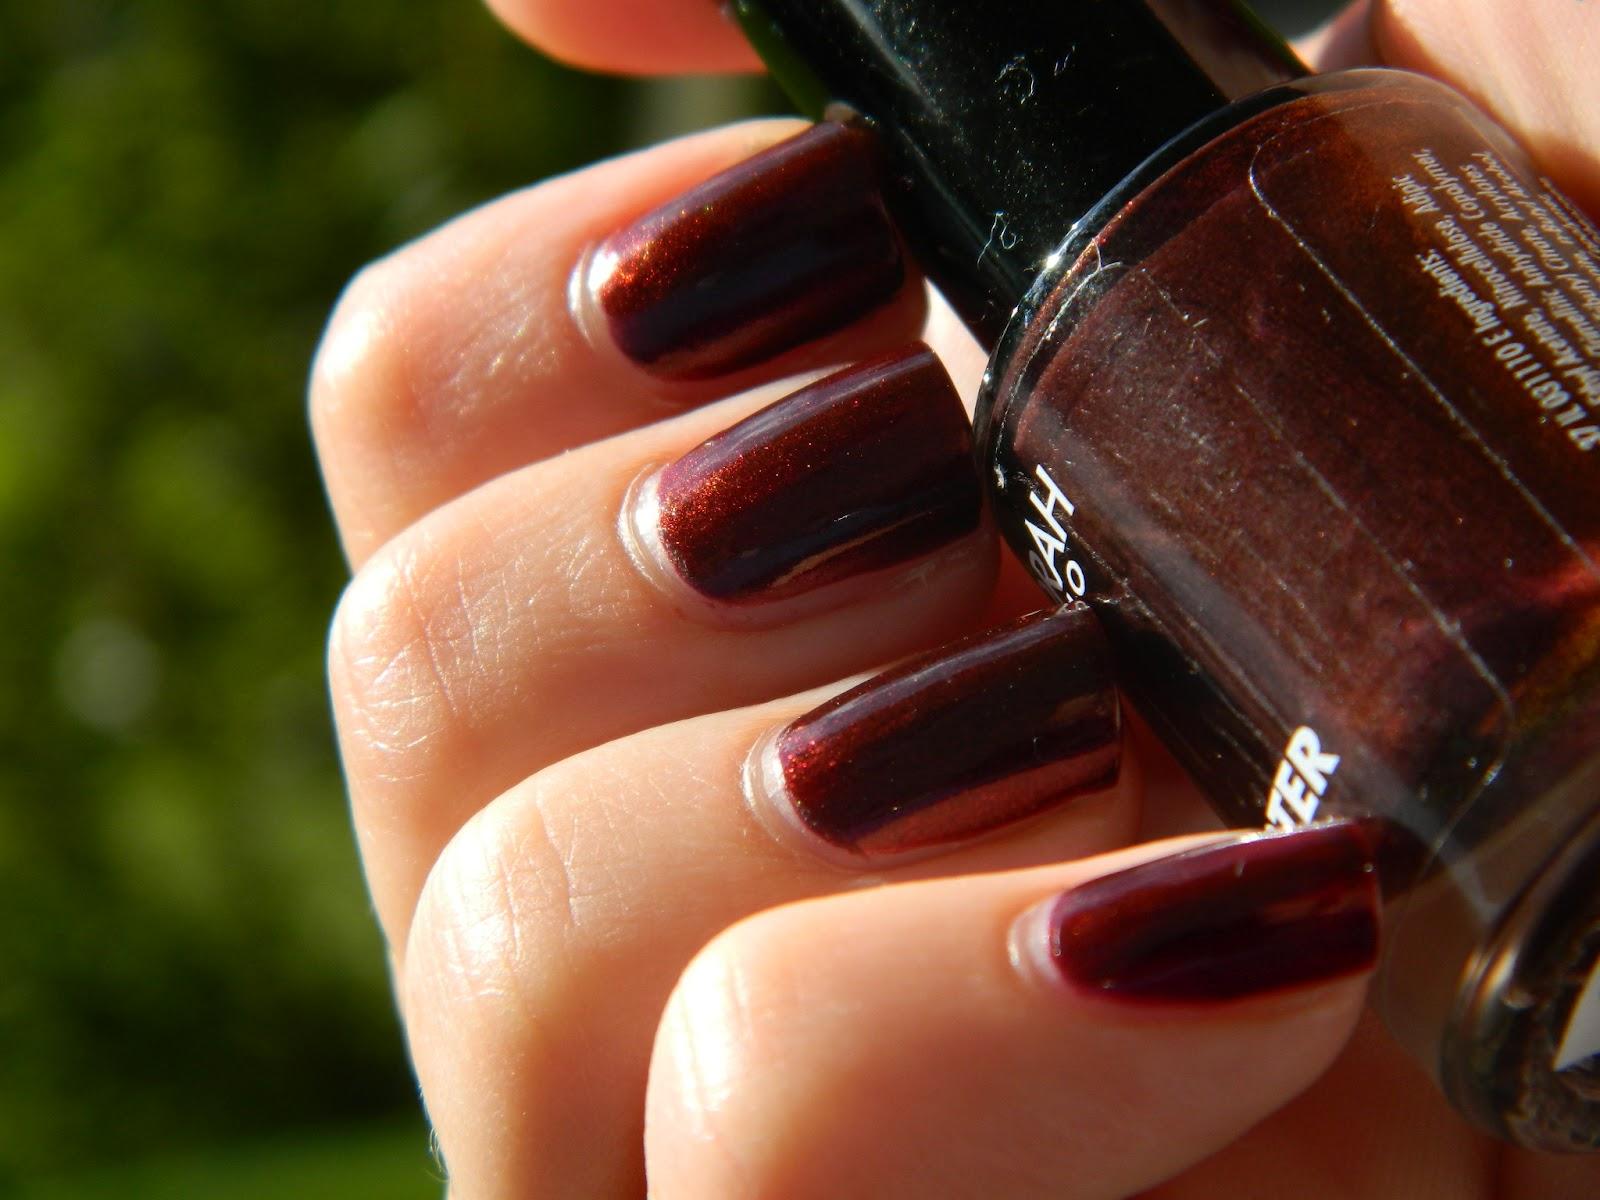 Mostly nail polish: Deborah - Burlesque Red